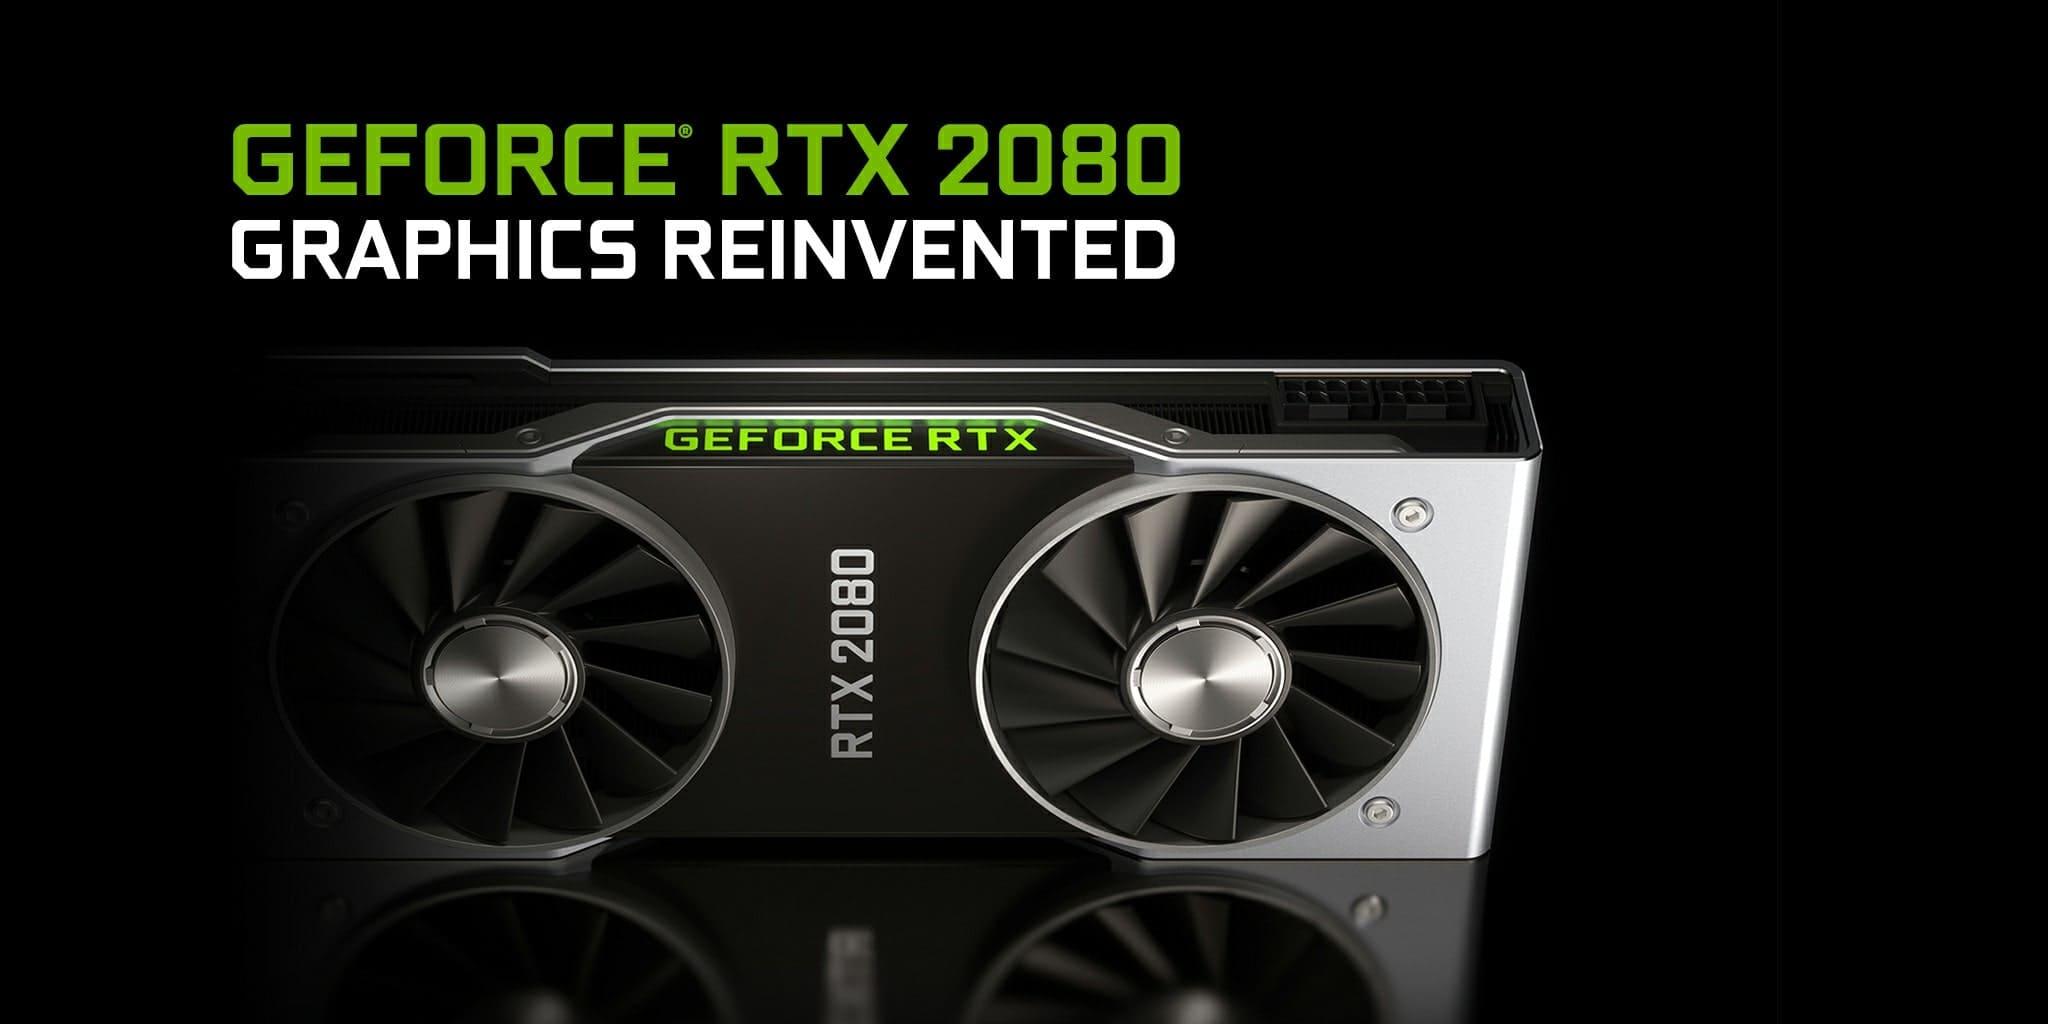 2080 RTX